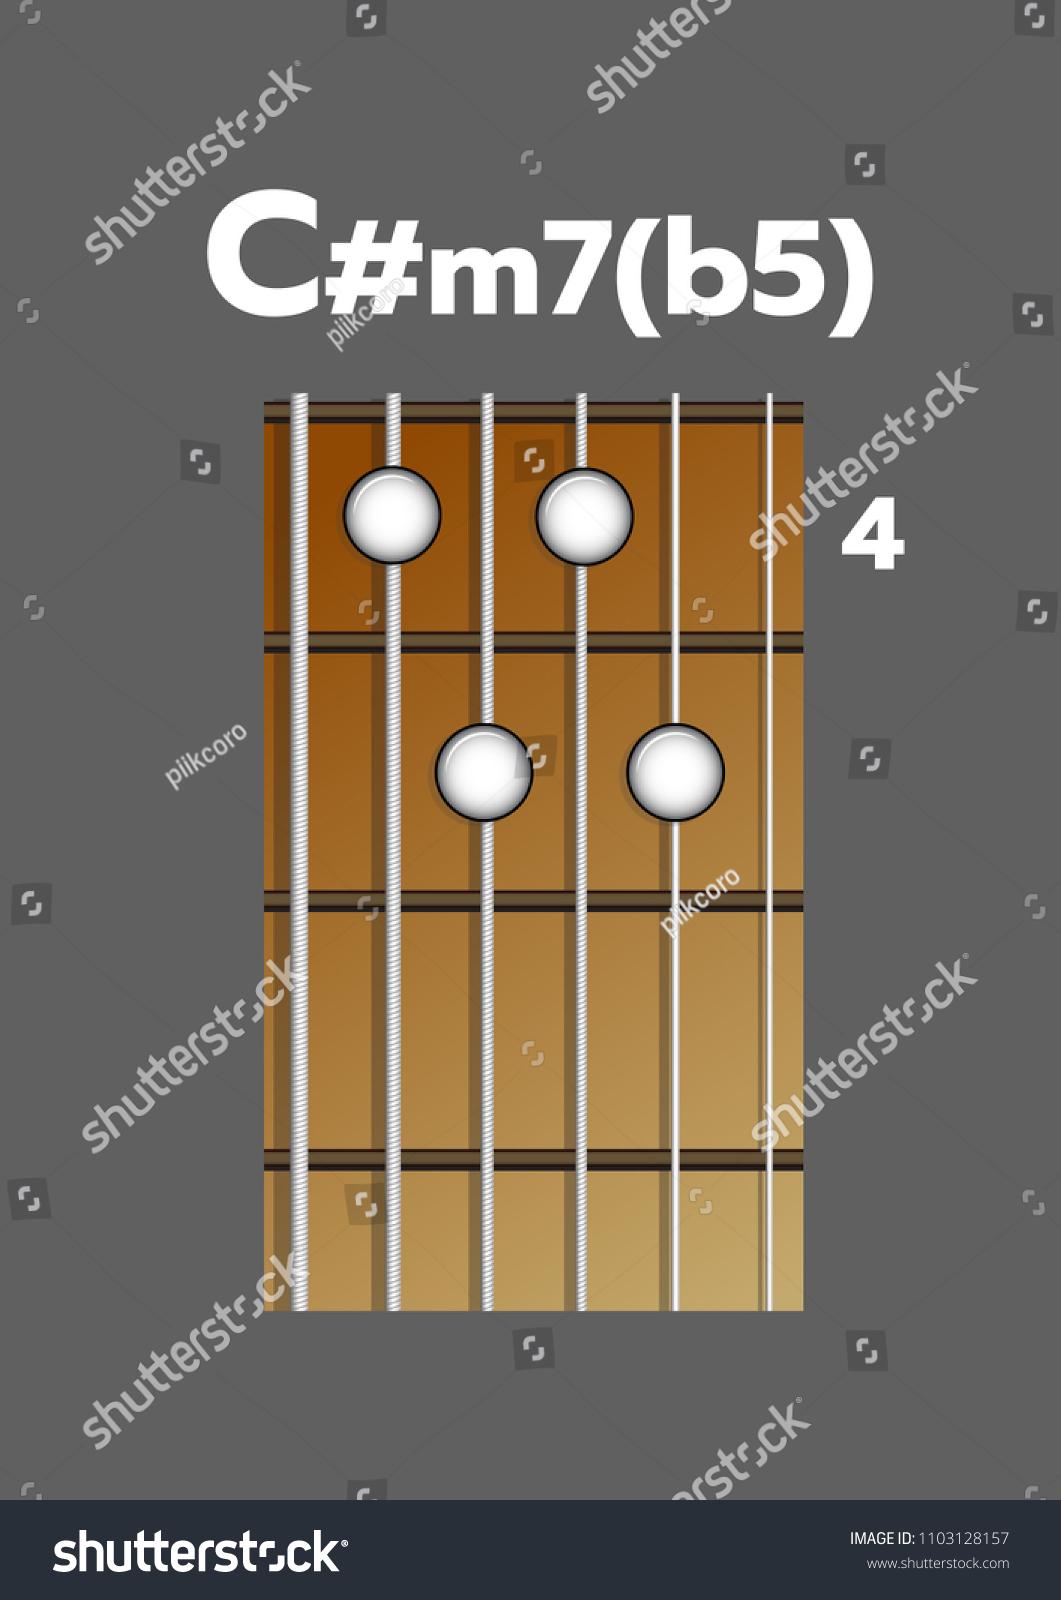 Unique G7sus Guitar Chord Composition Beginner Guitar Piano Chords